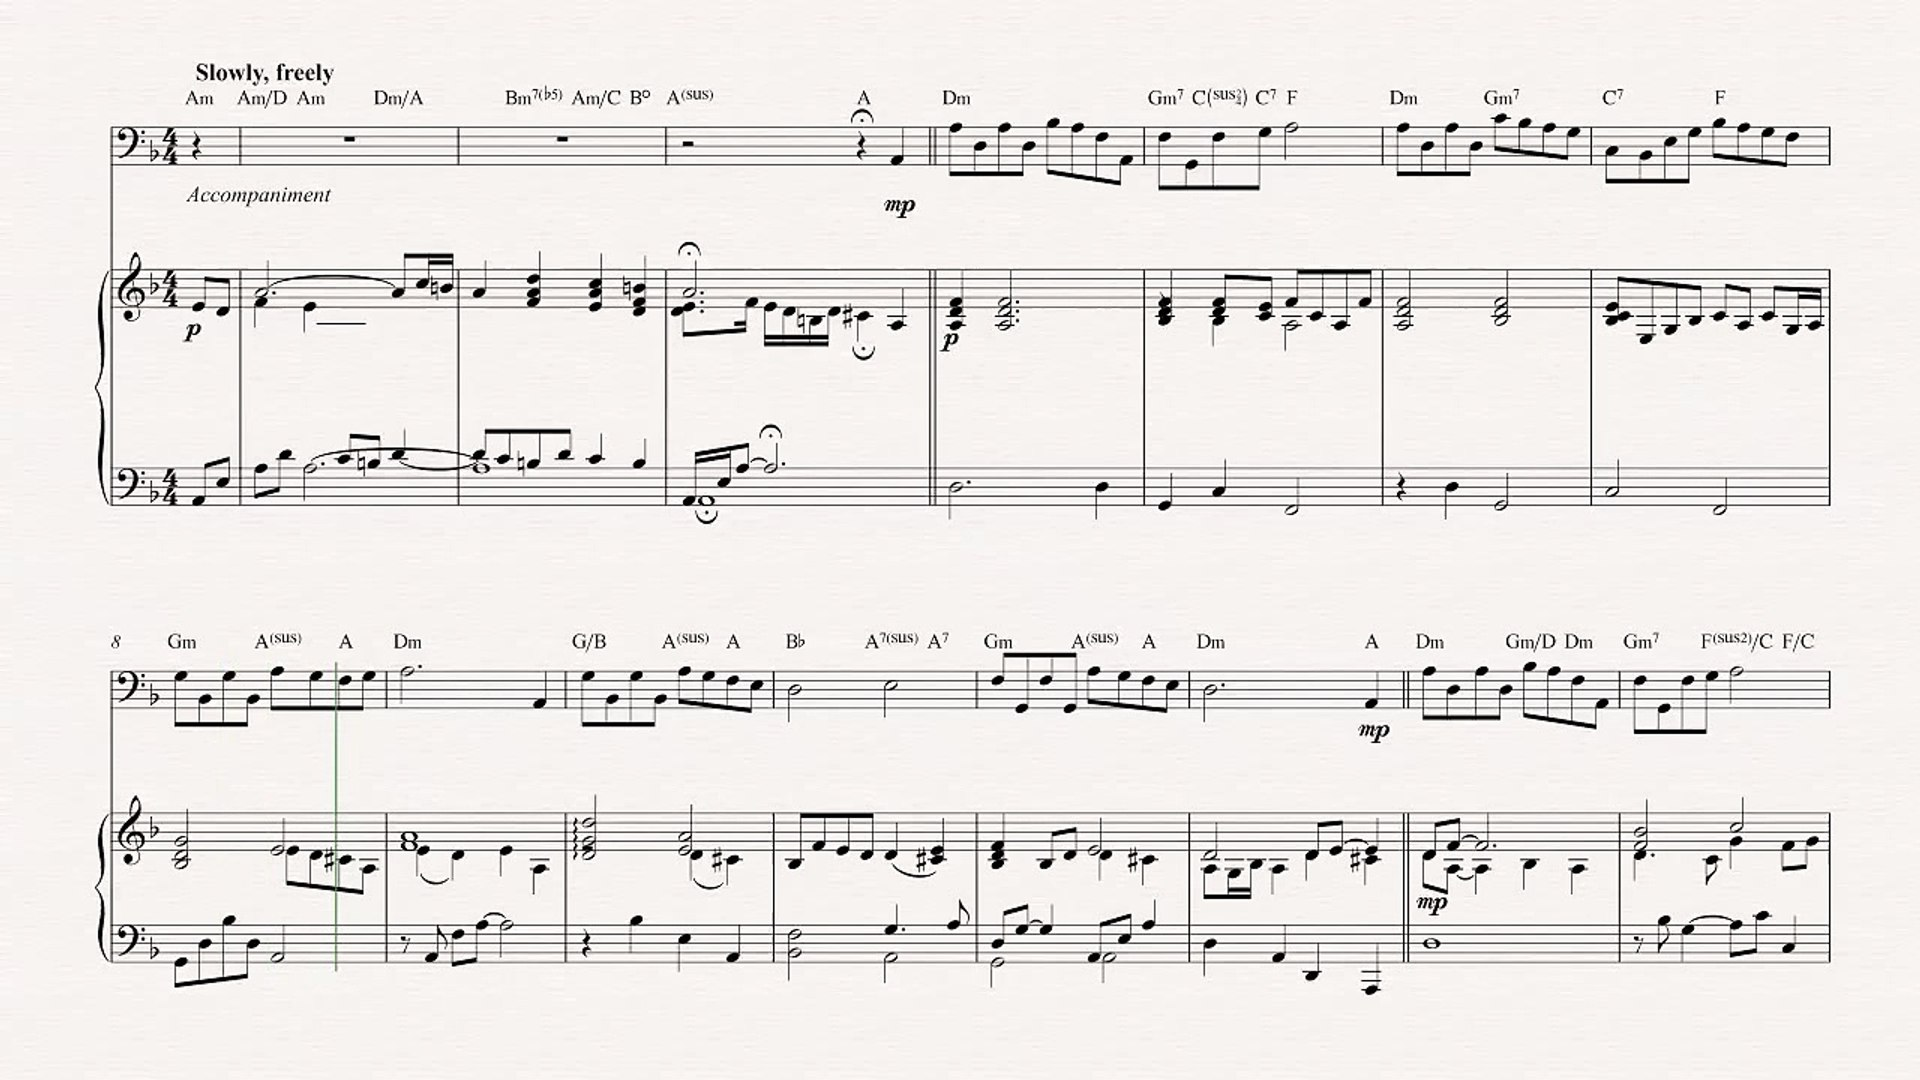 Cello - Schindler's List Theme - John Williams - Sheet Music, Chords, &  Vocals